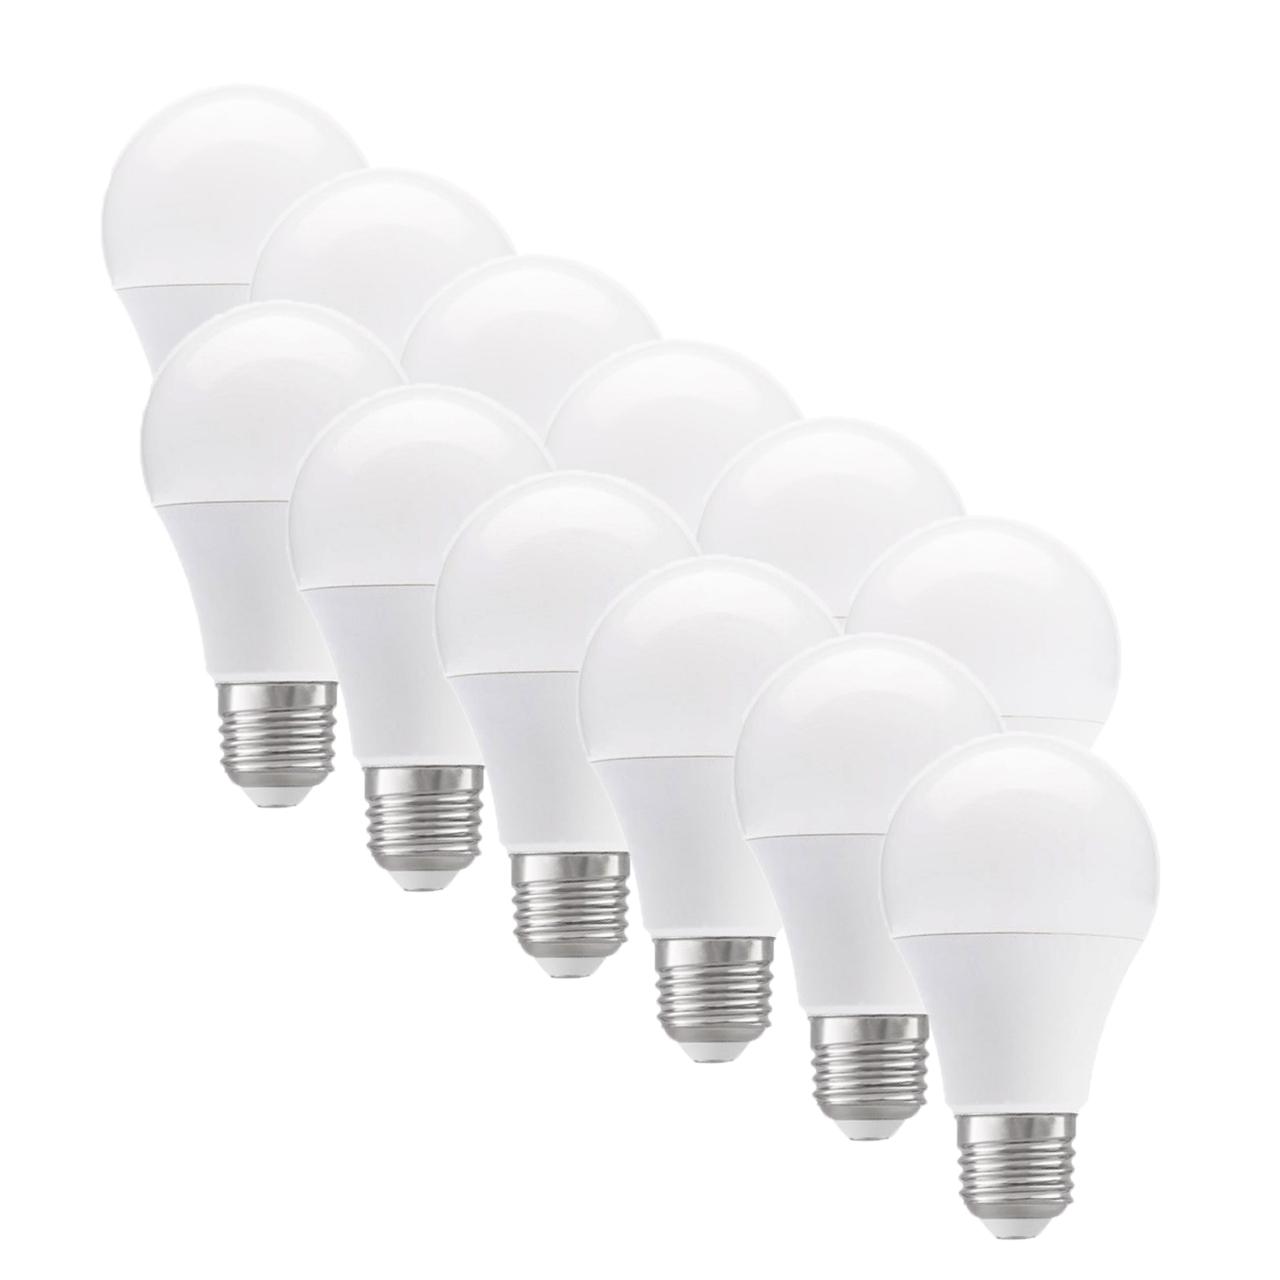 لامپ ال ای دی 9 وات مونلایت پایه E27 بسته 12 عددی